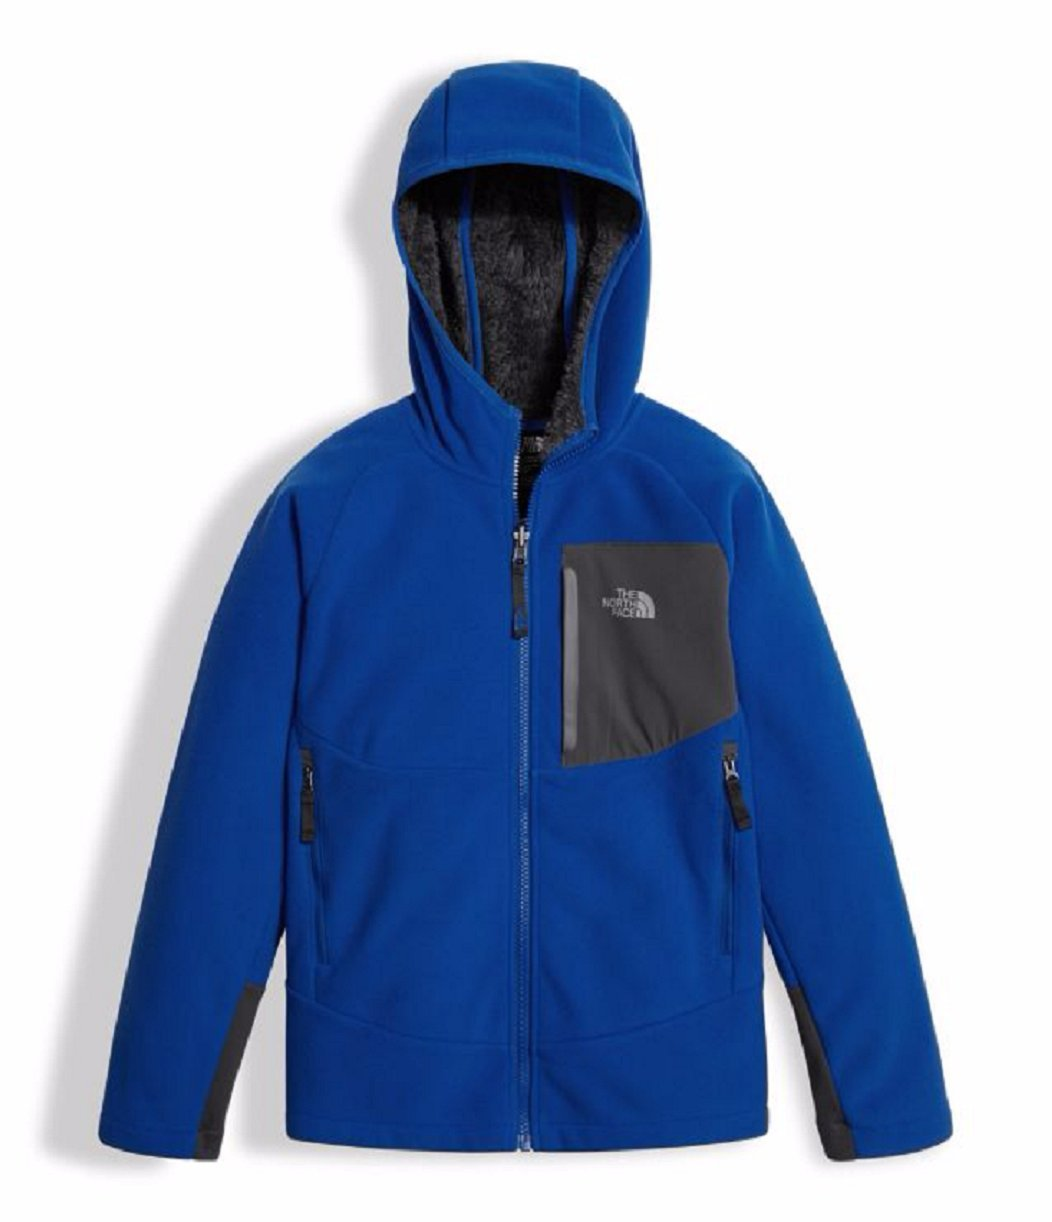 The North Face Boys' Chimborazo Hoodie - bright cobalt blue, s/7-8